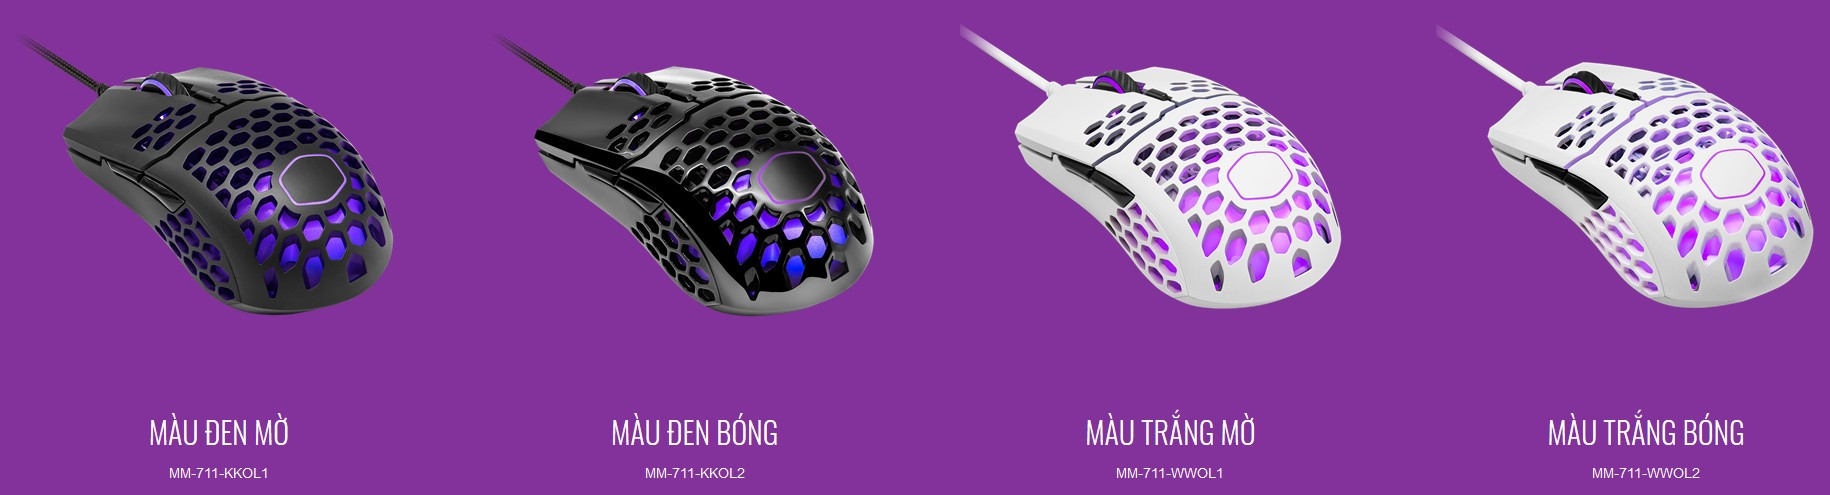 Chuột Gaming Cooler Master MM711 Black Matte RGB